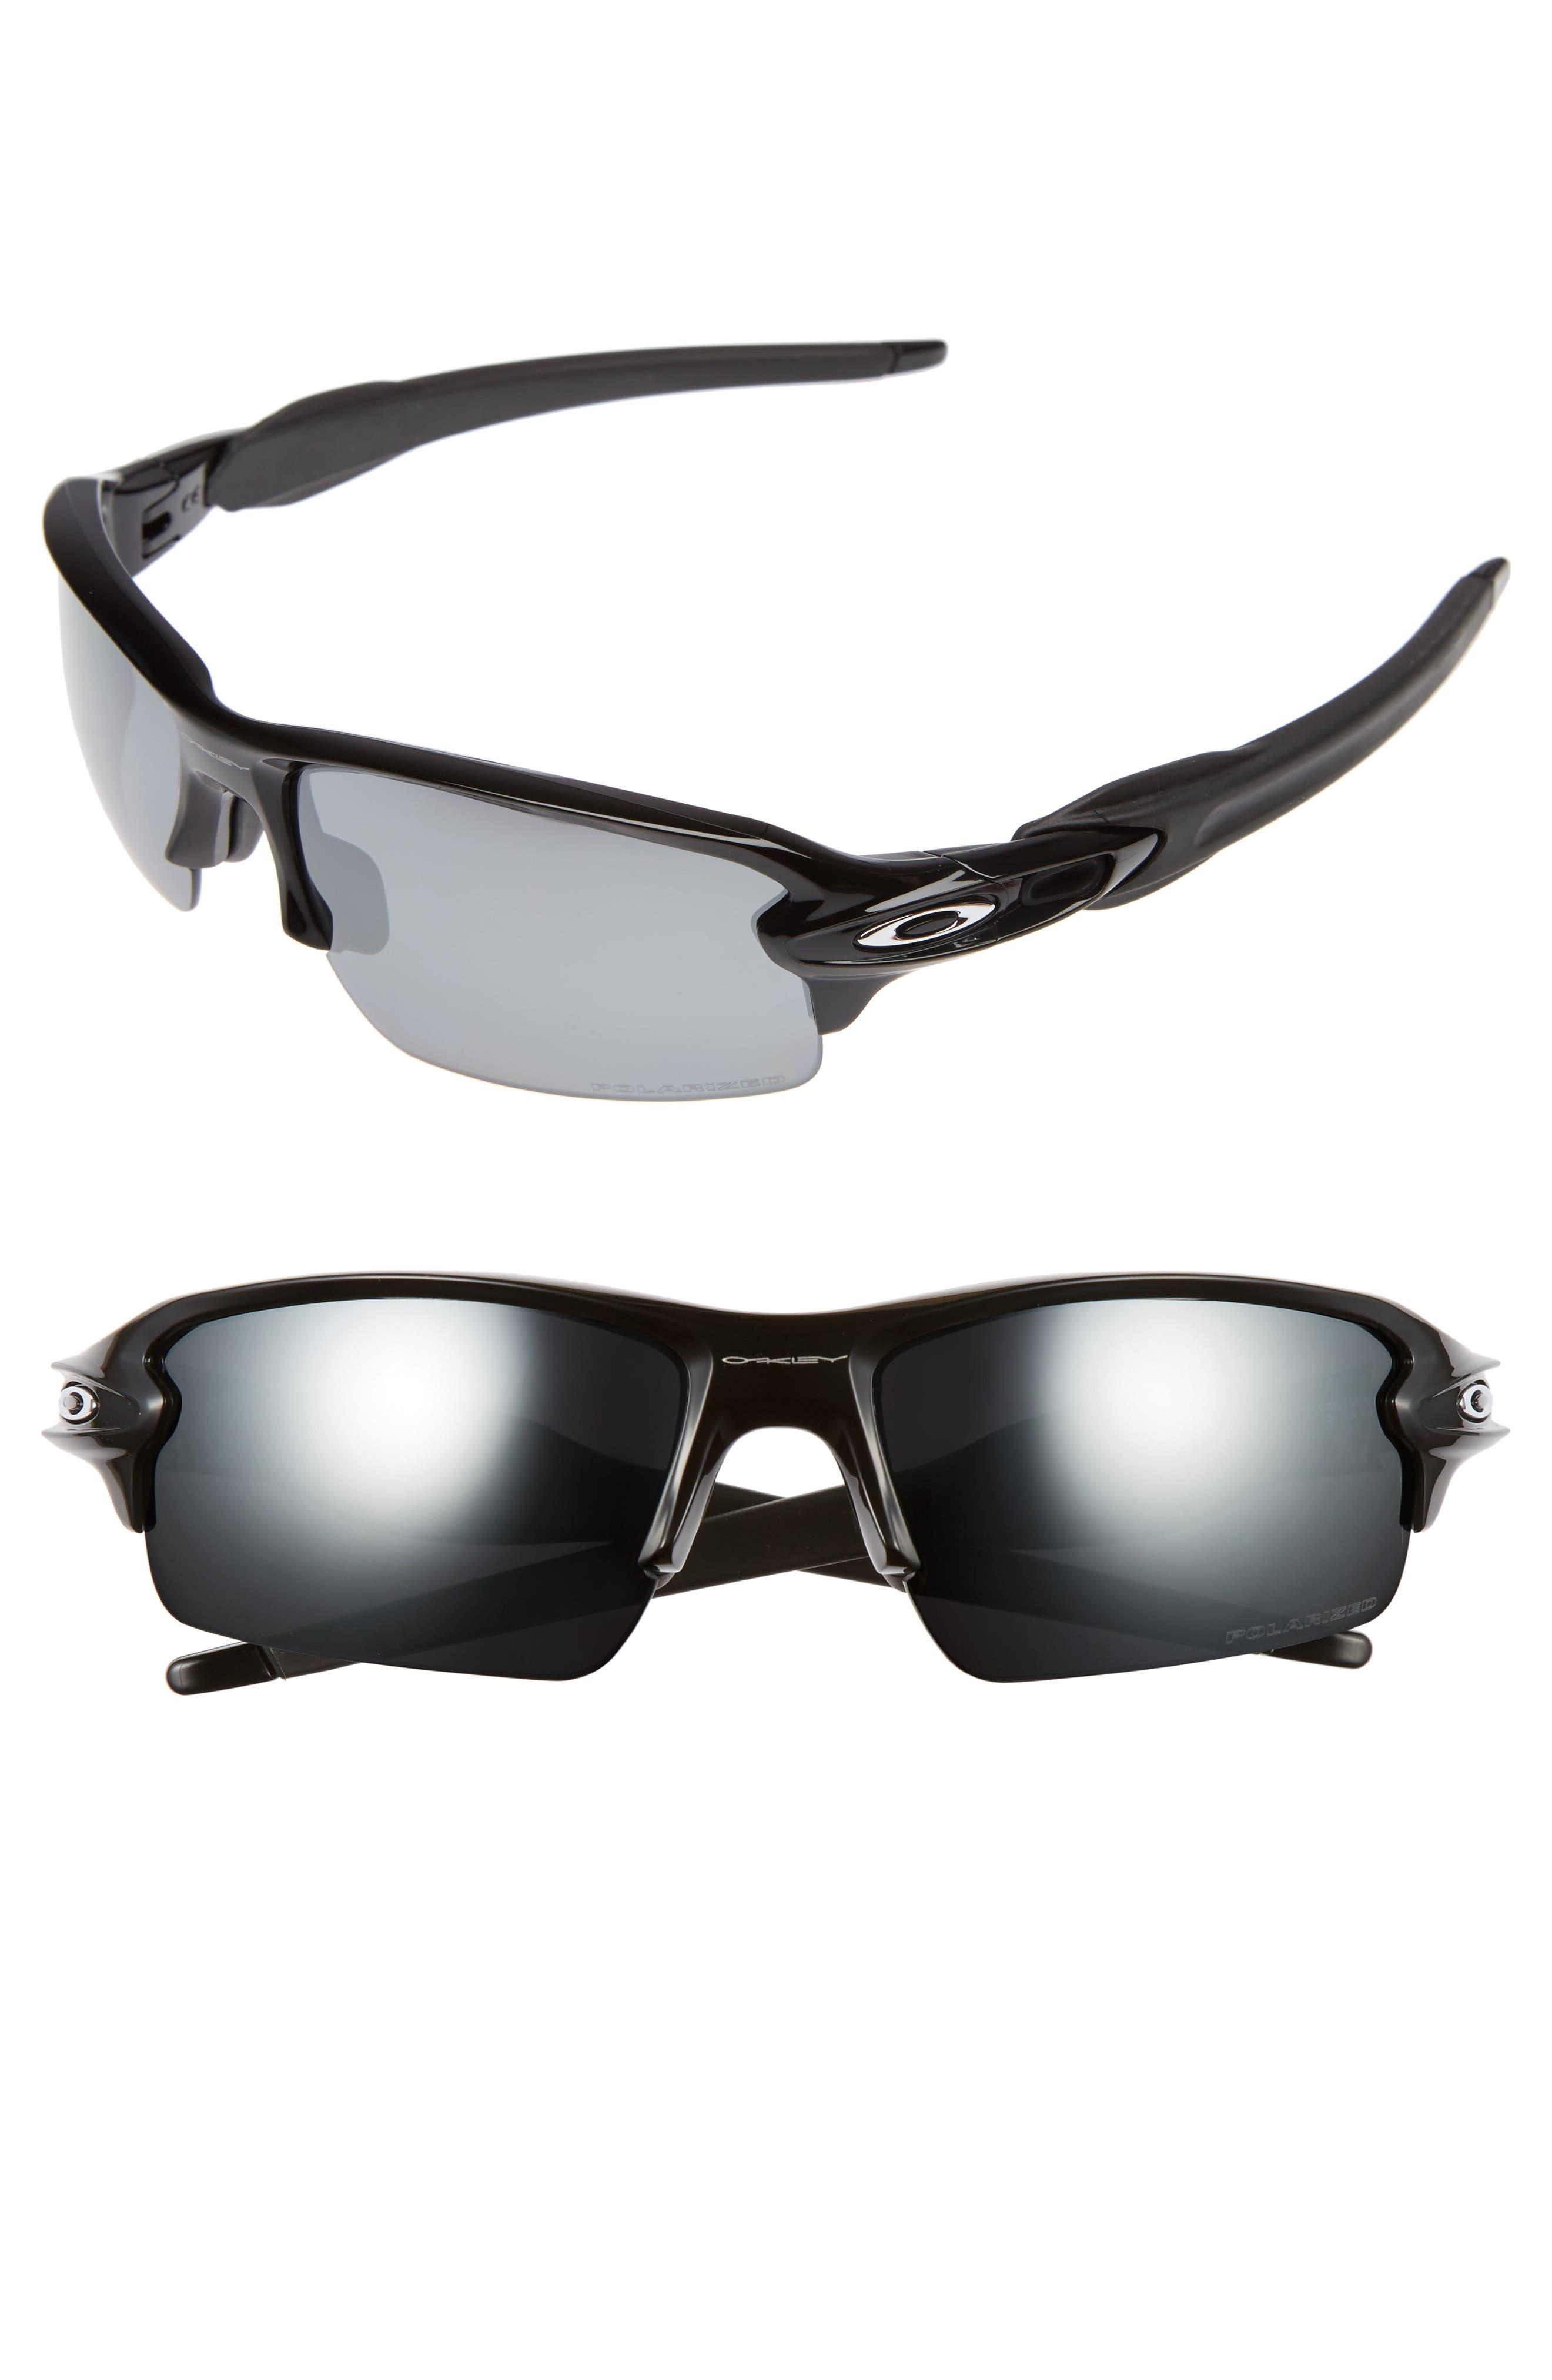 Oakley Flak 2.0 5m Polarized Sunglasses -